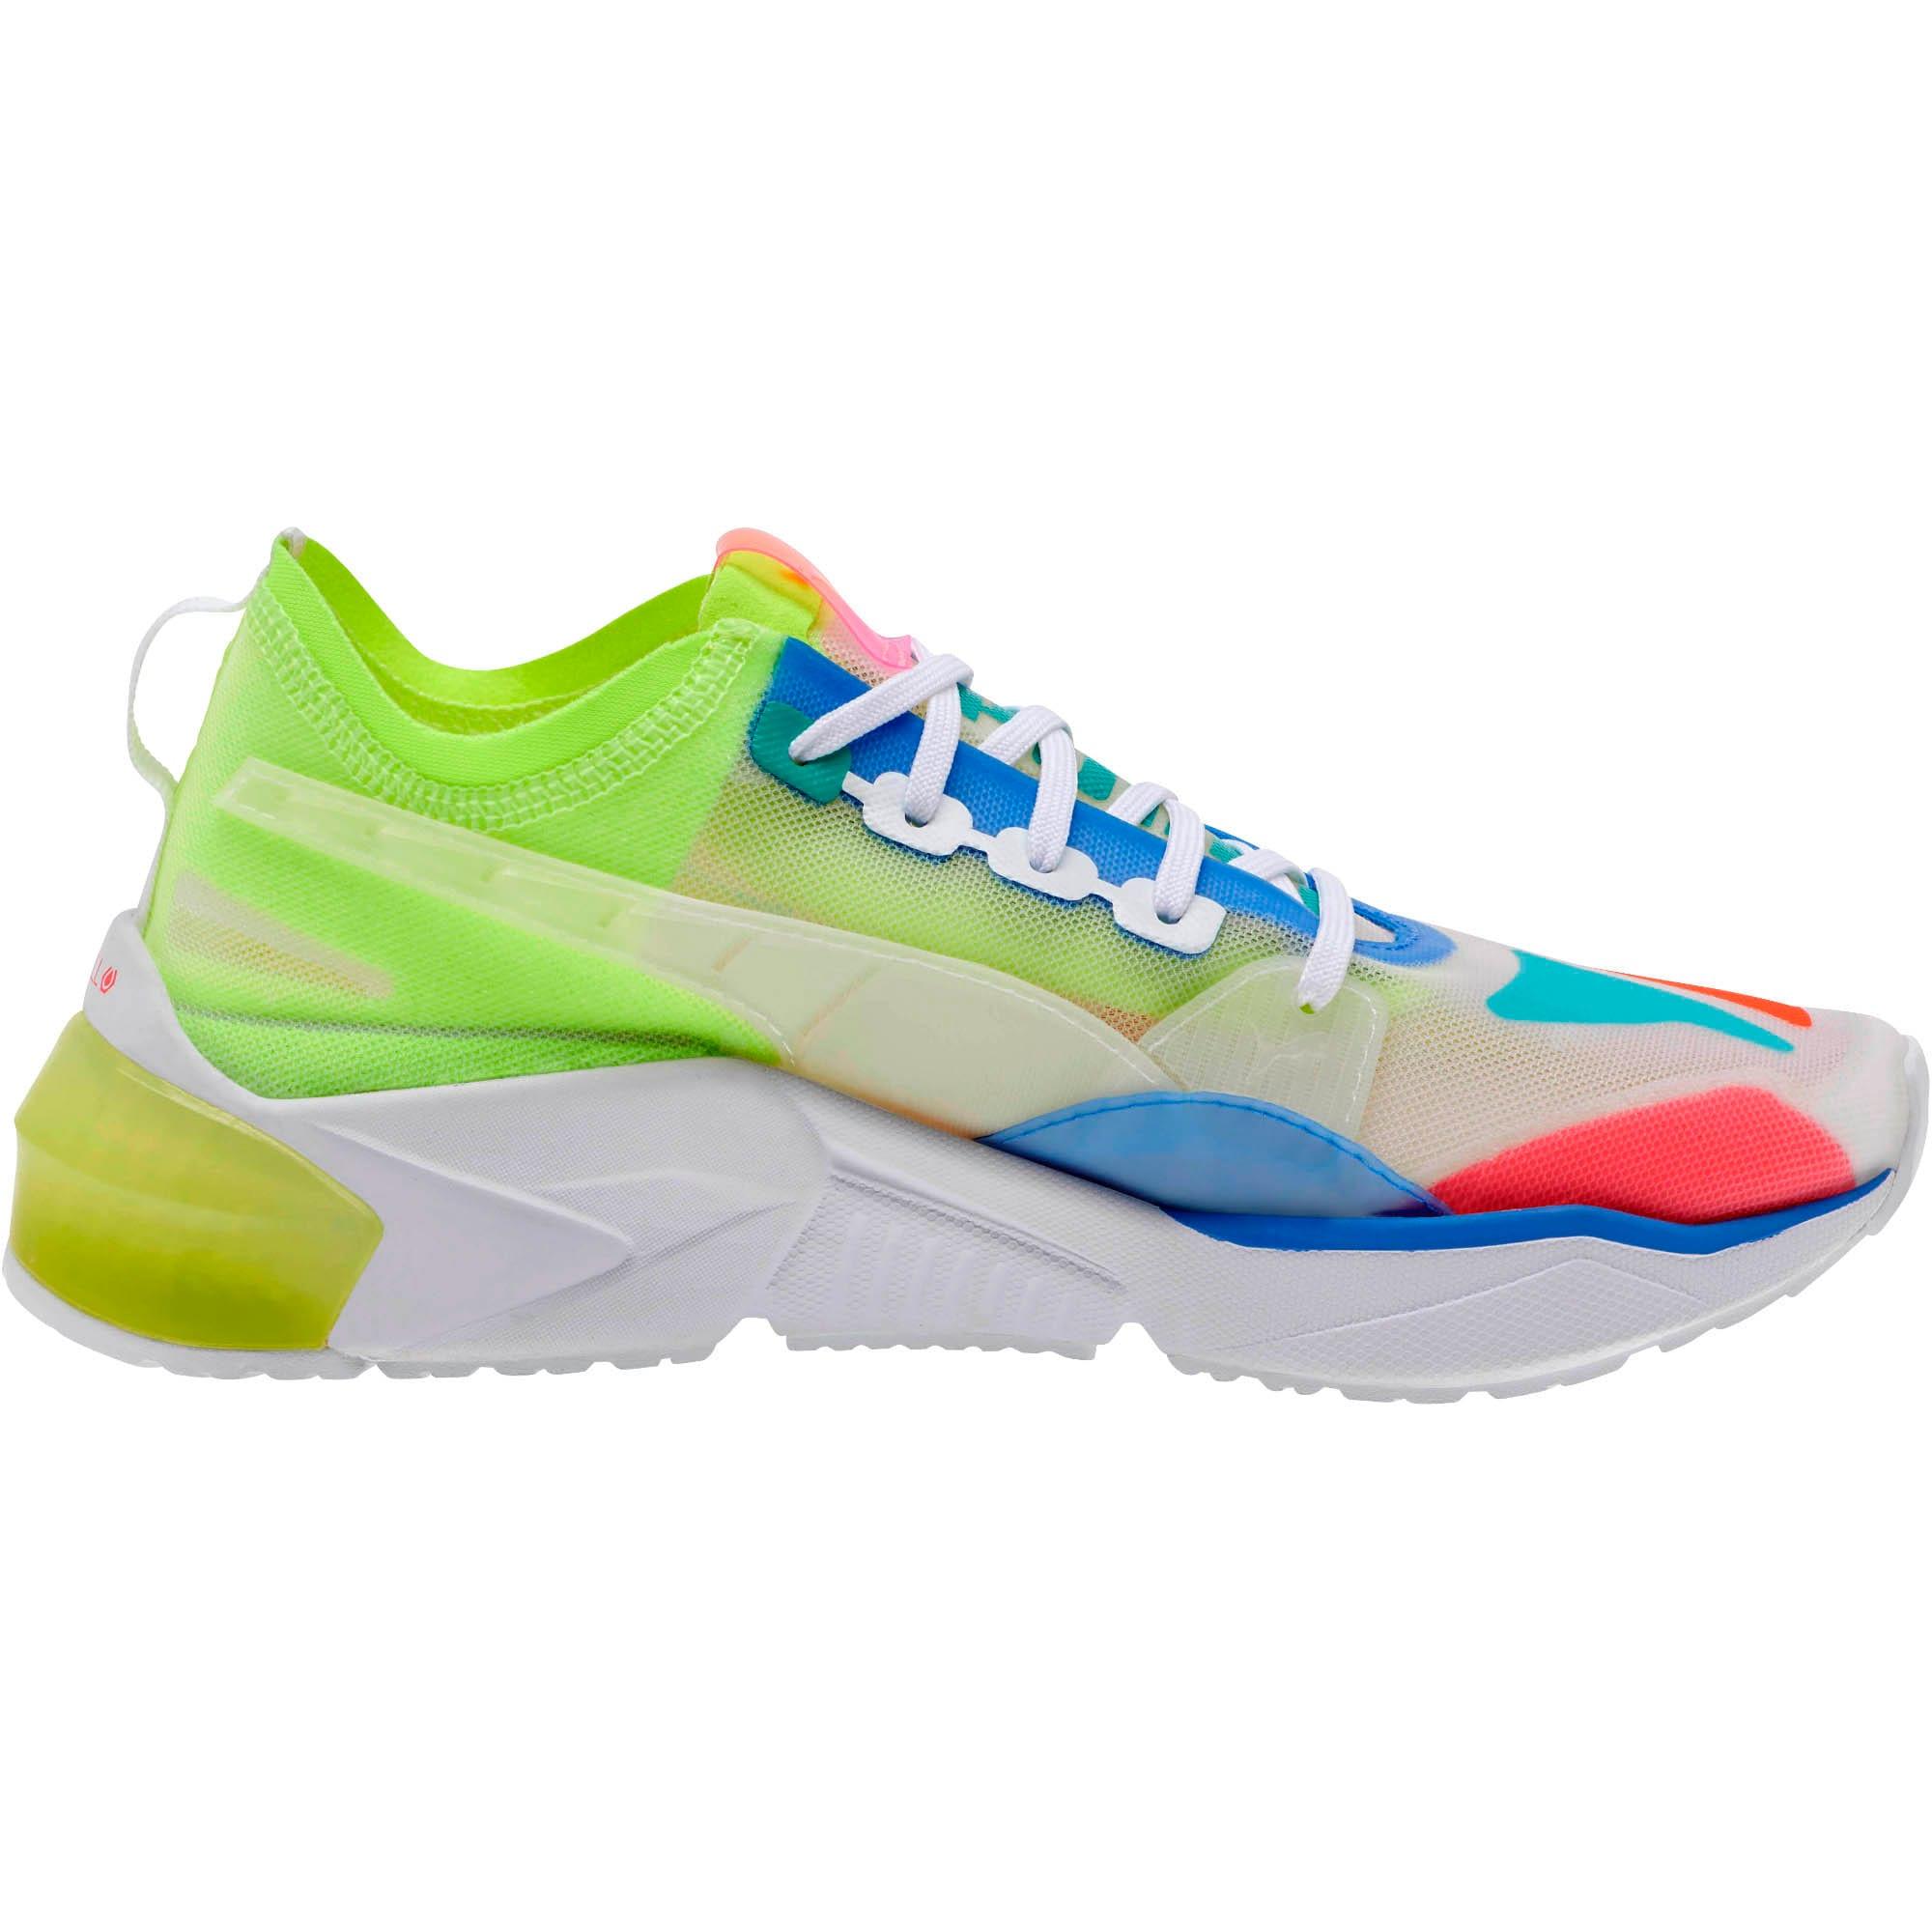 Thumbnail 4 of LQDCELL Optic Sheer Women's Training Shoes, Puma White, medium